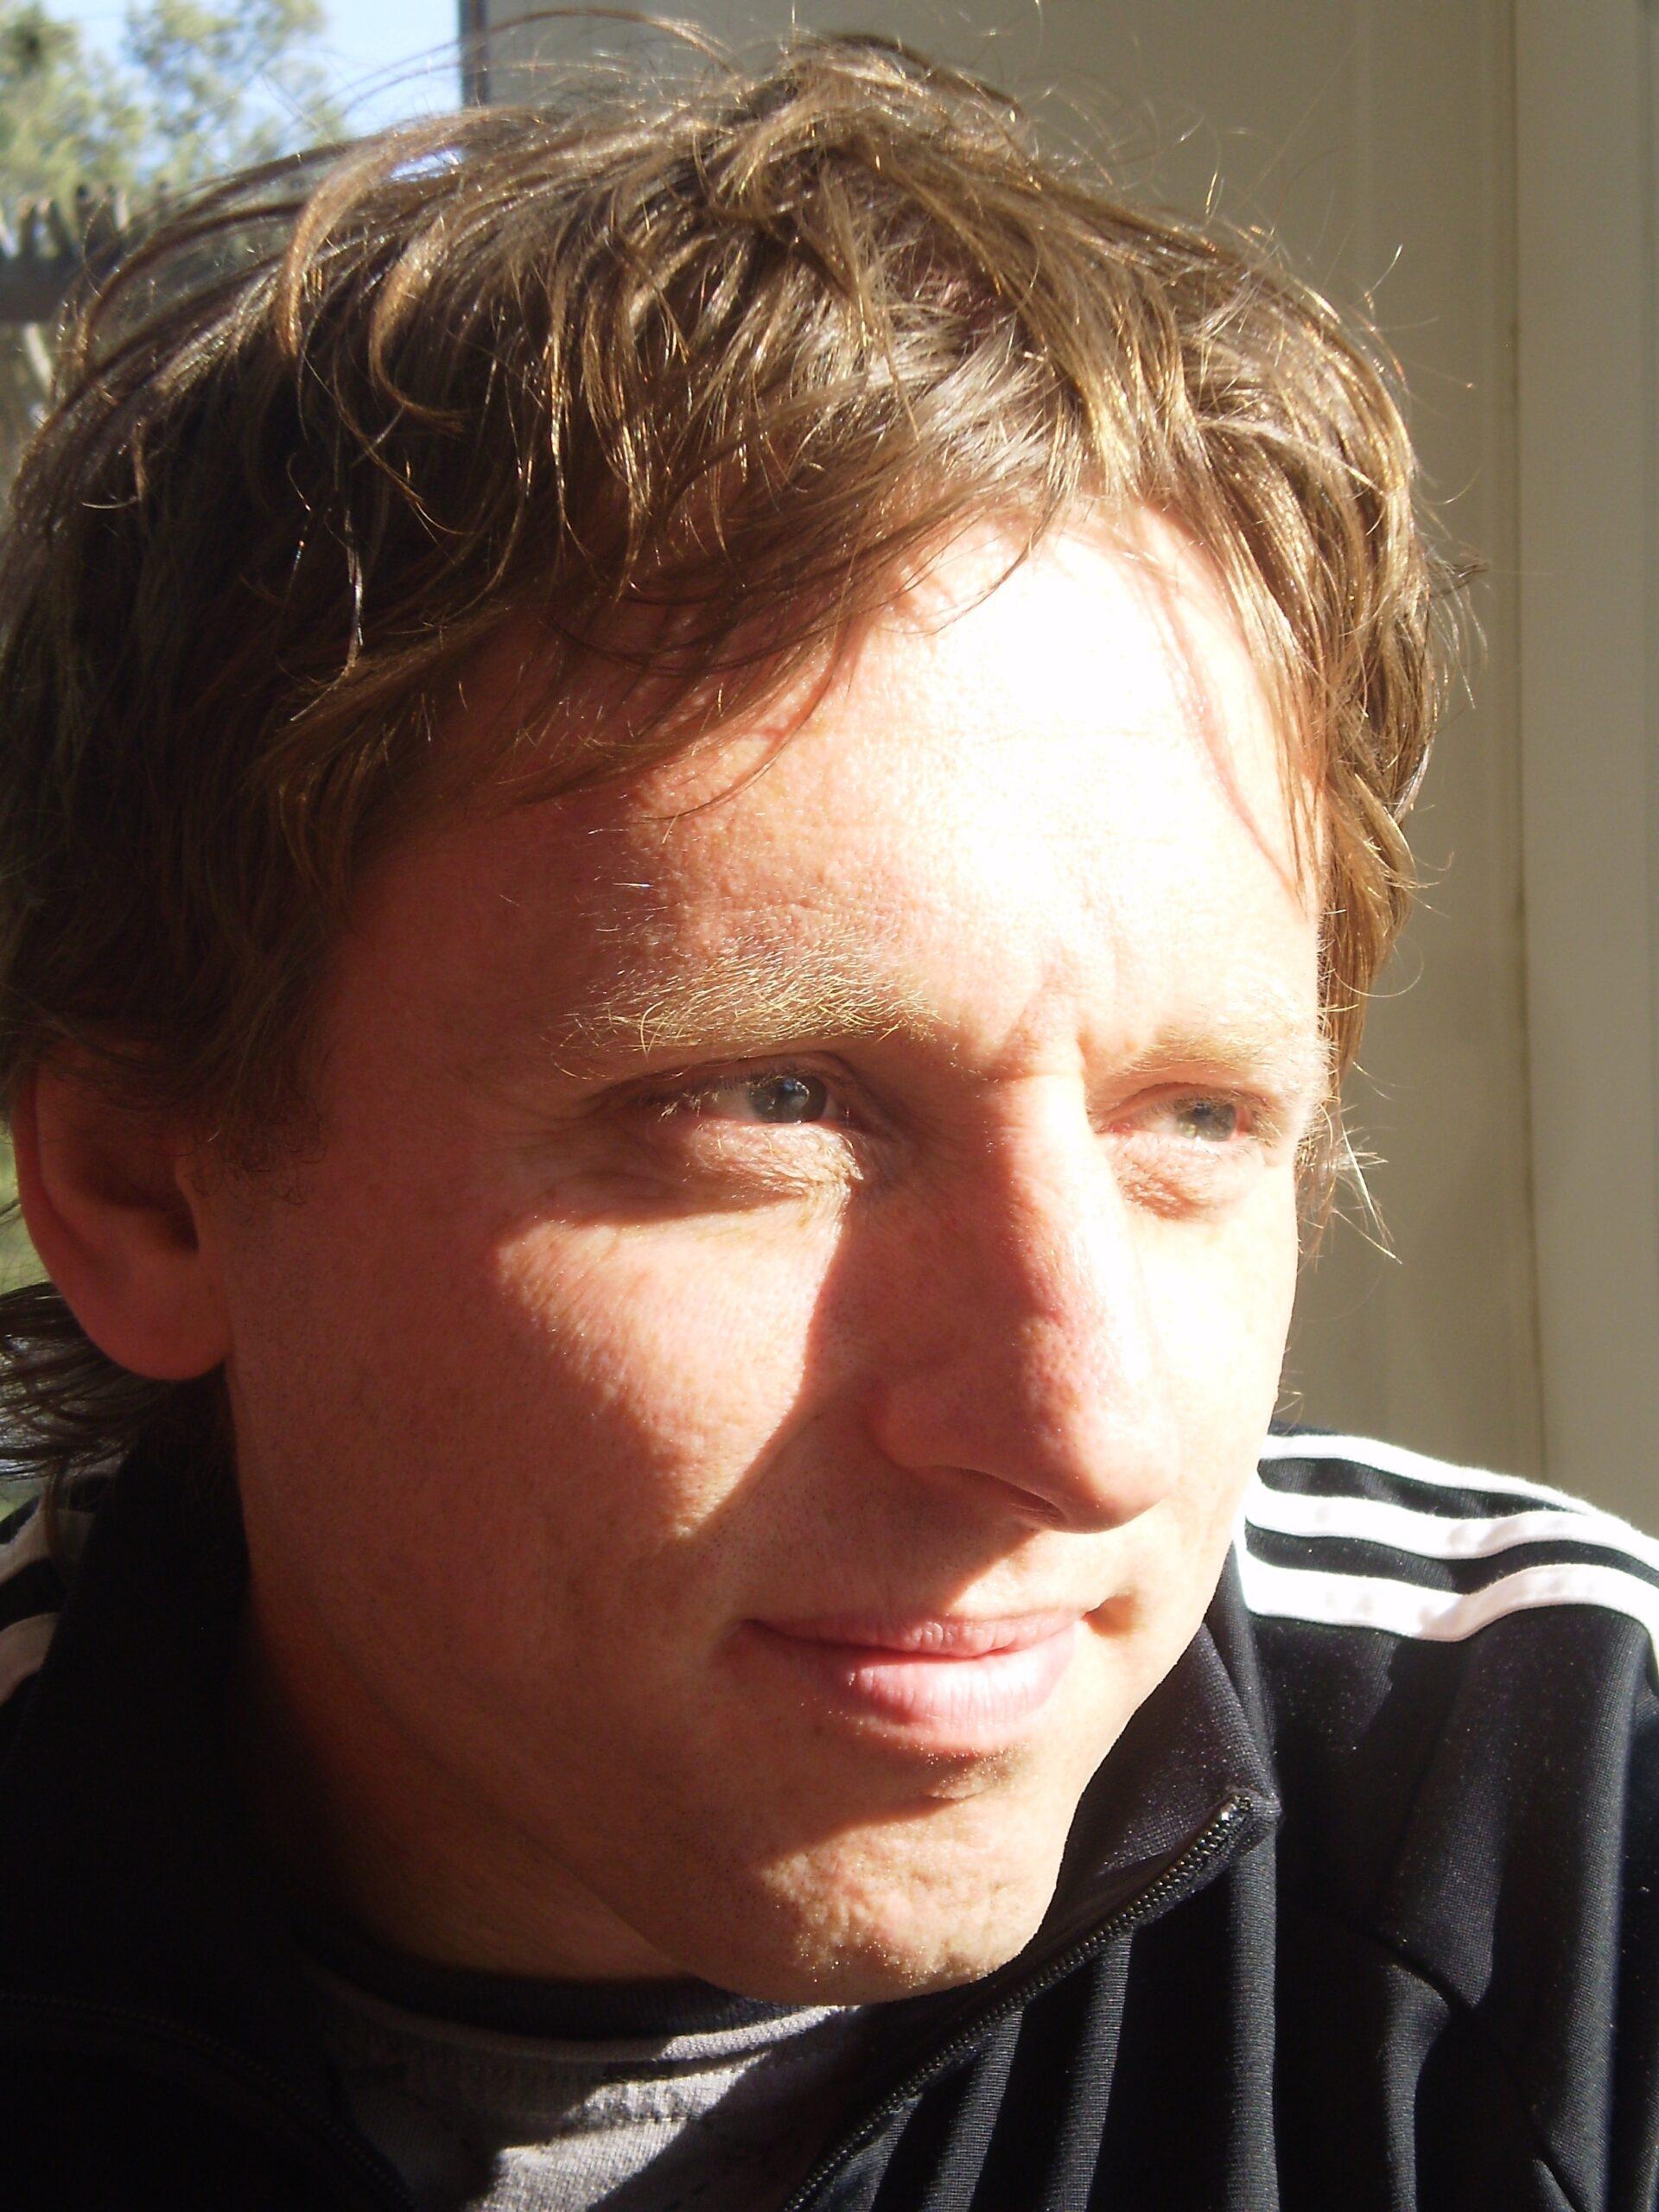 Martín Schorr